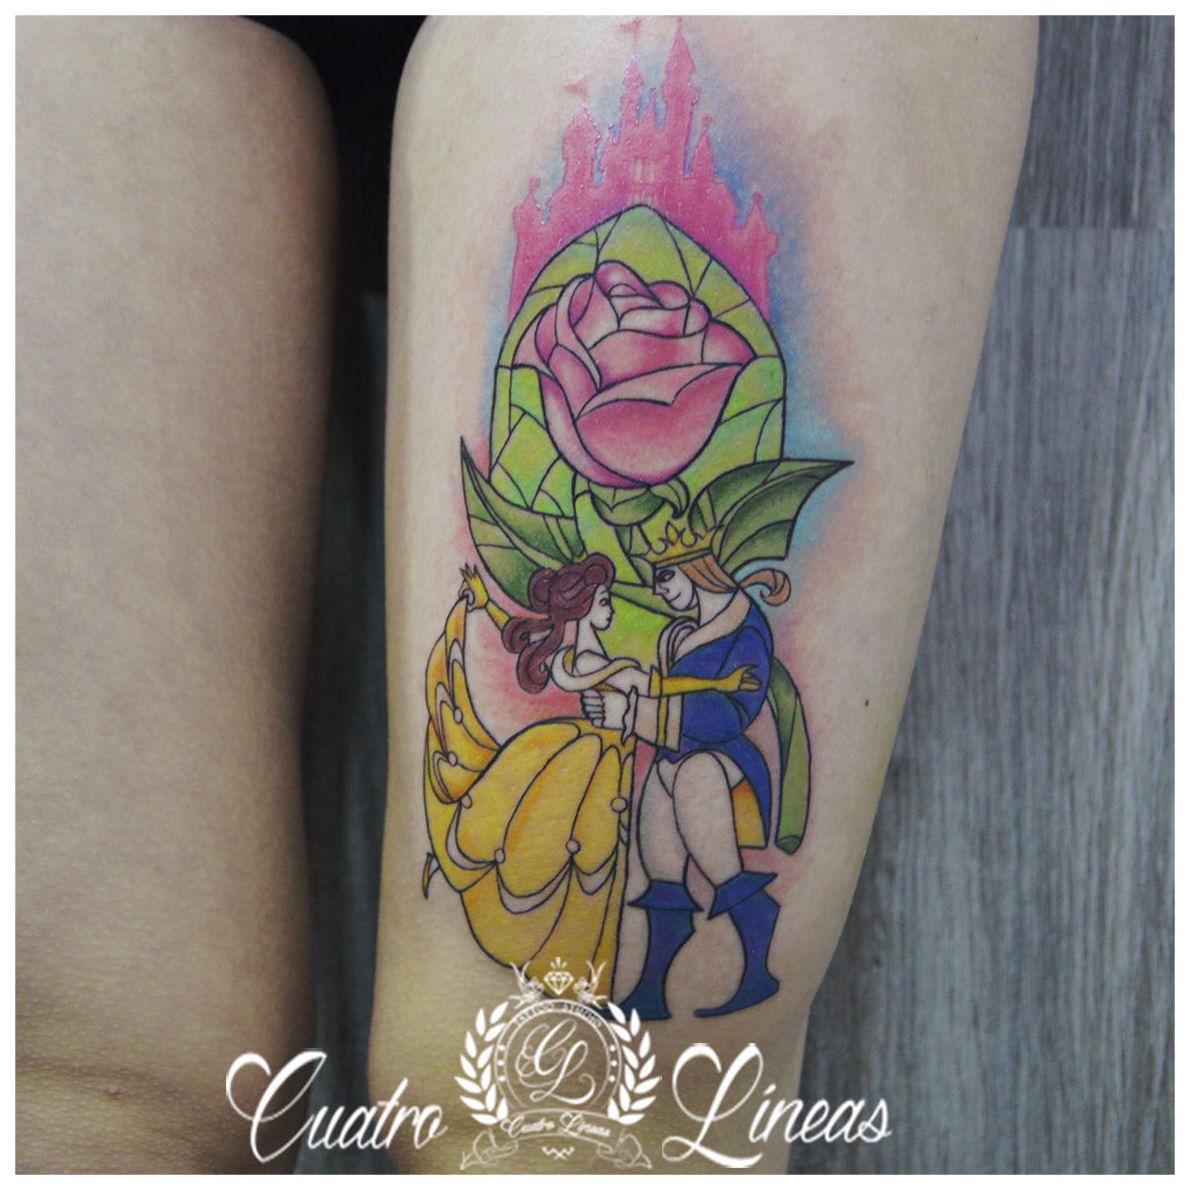 Tatuaje Disney Bella y bestia neotradicional